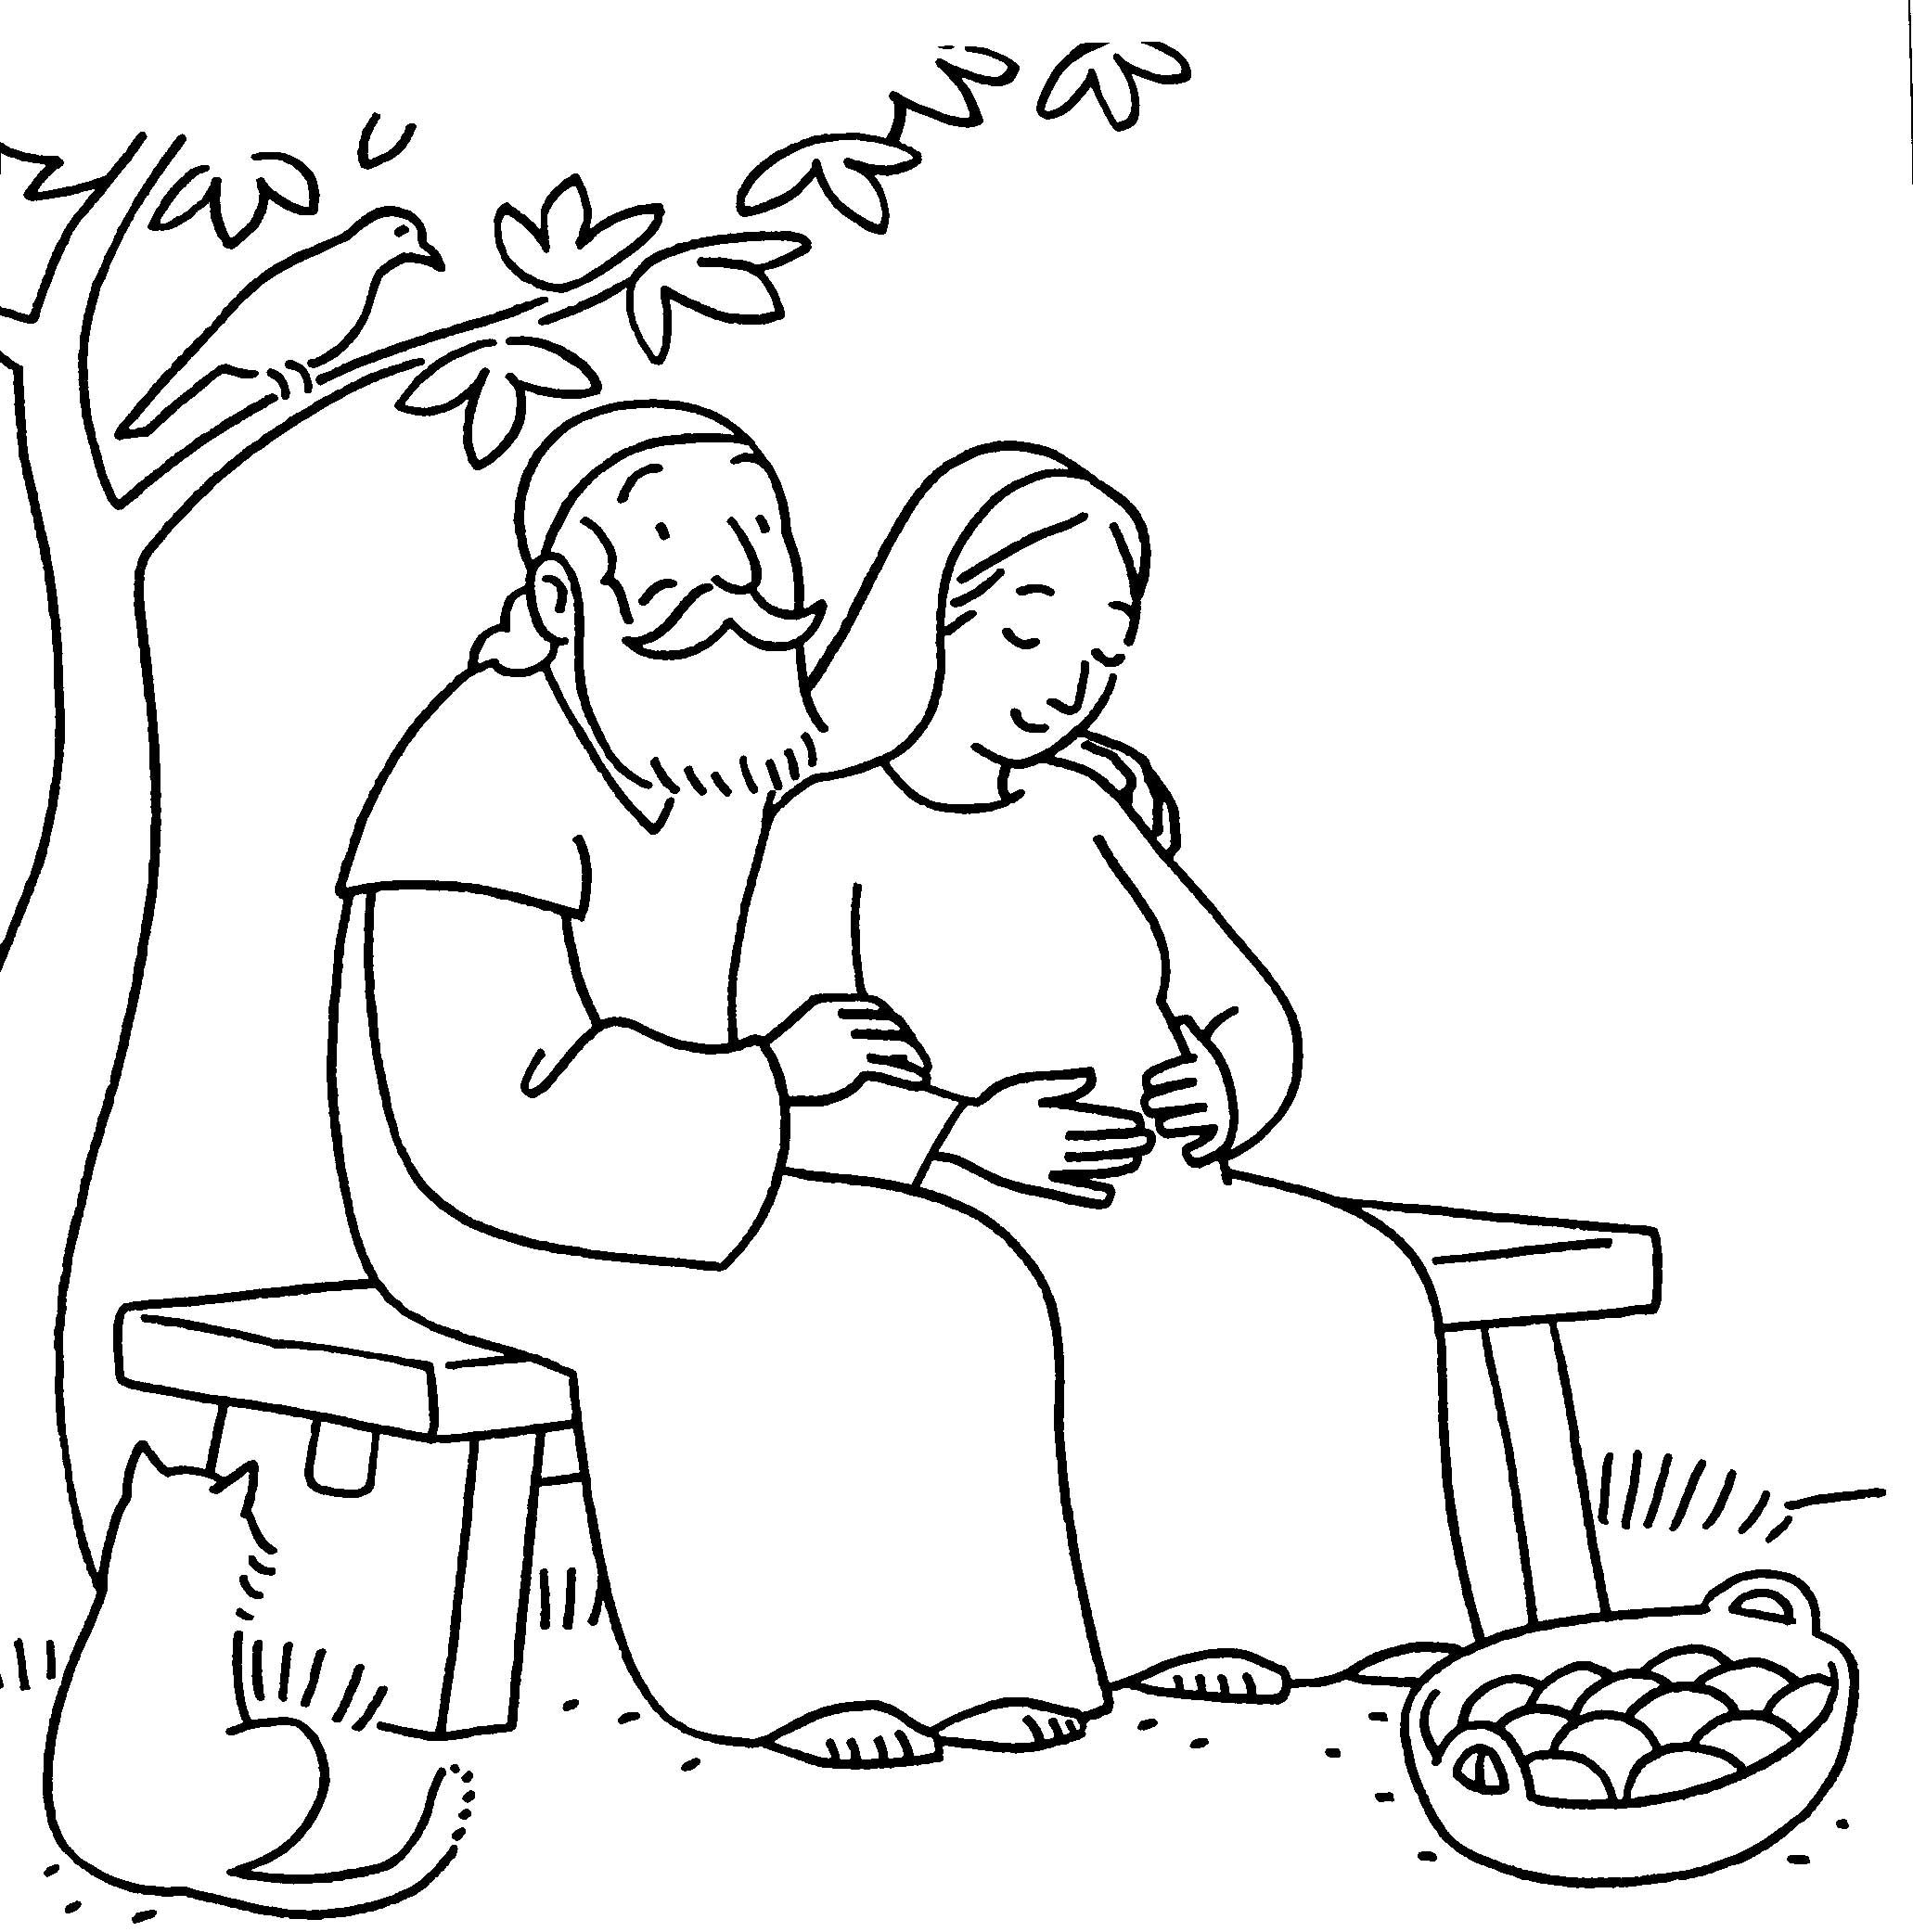 Elizabeth And Zechariah Gods Promises By Sarah Michael Lesson 6 PromisesColoring SheetsSunday SchoolBible